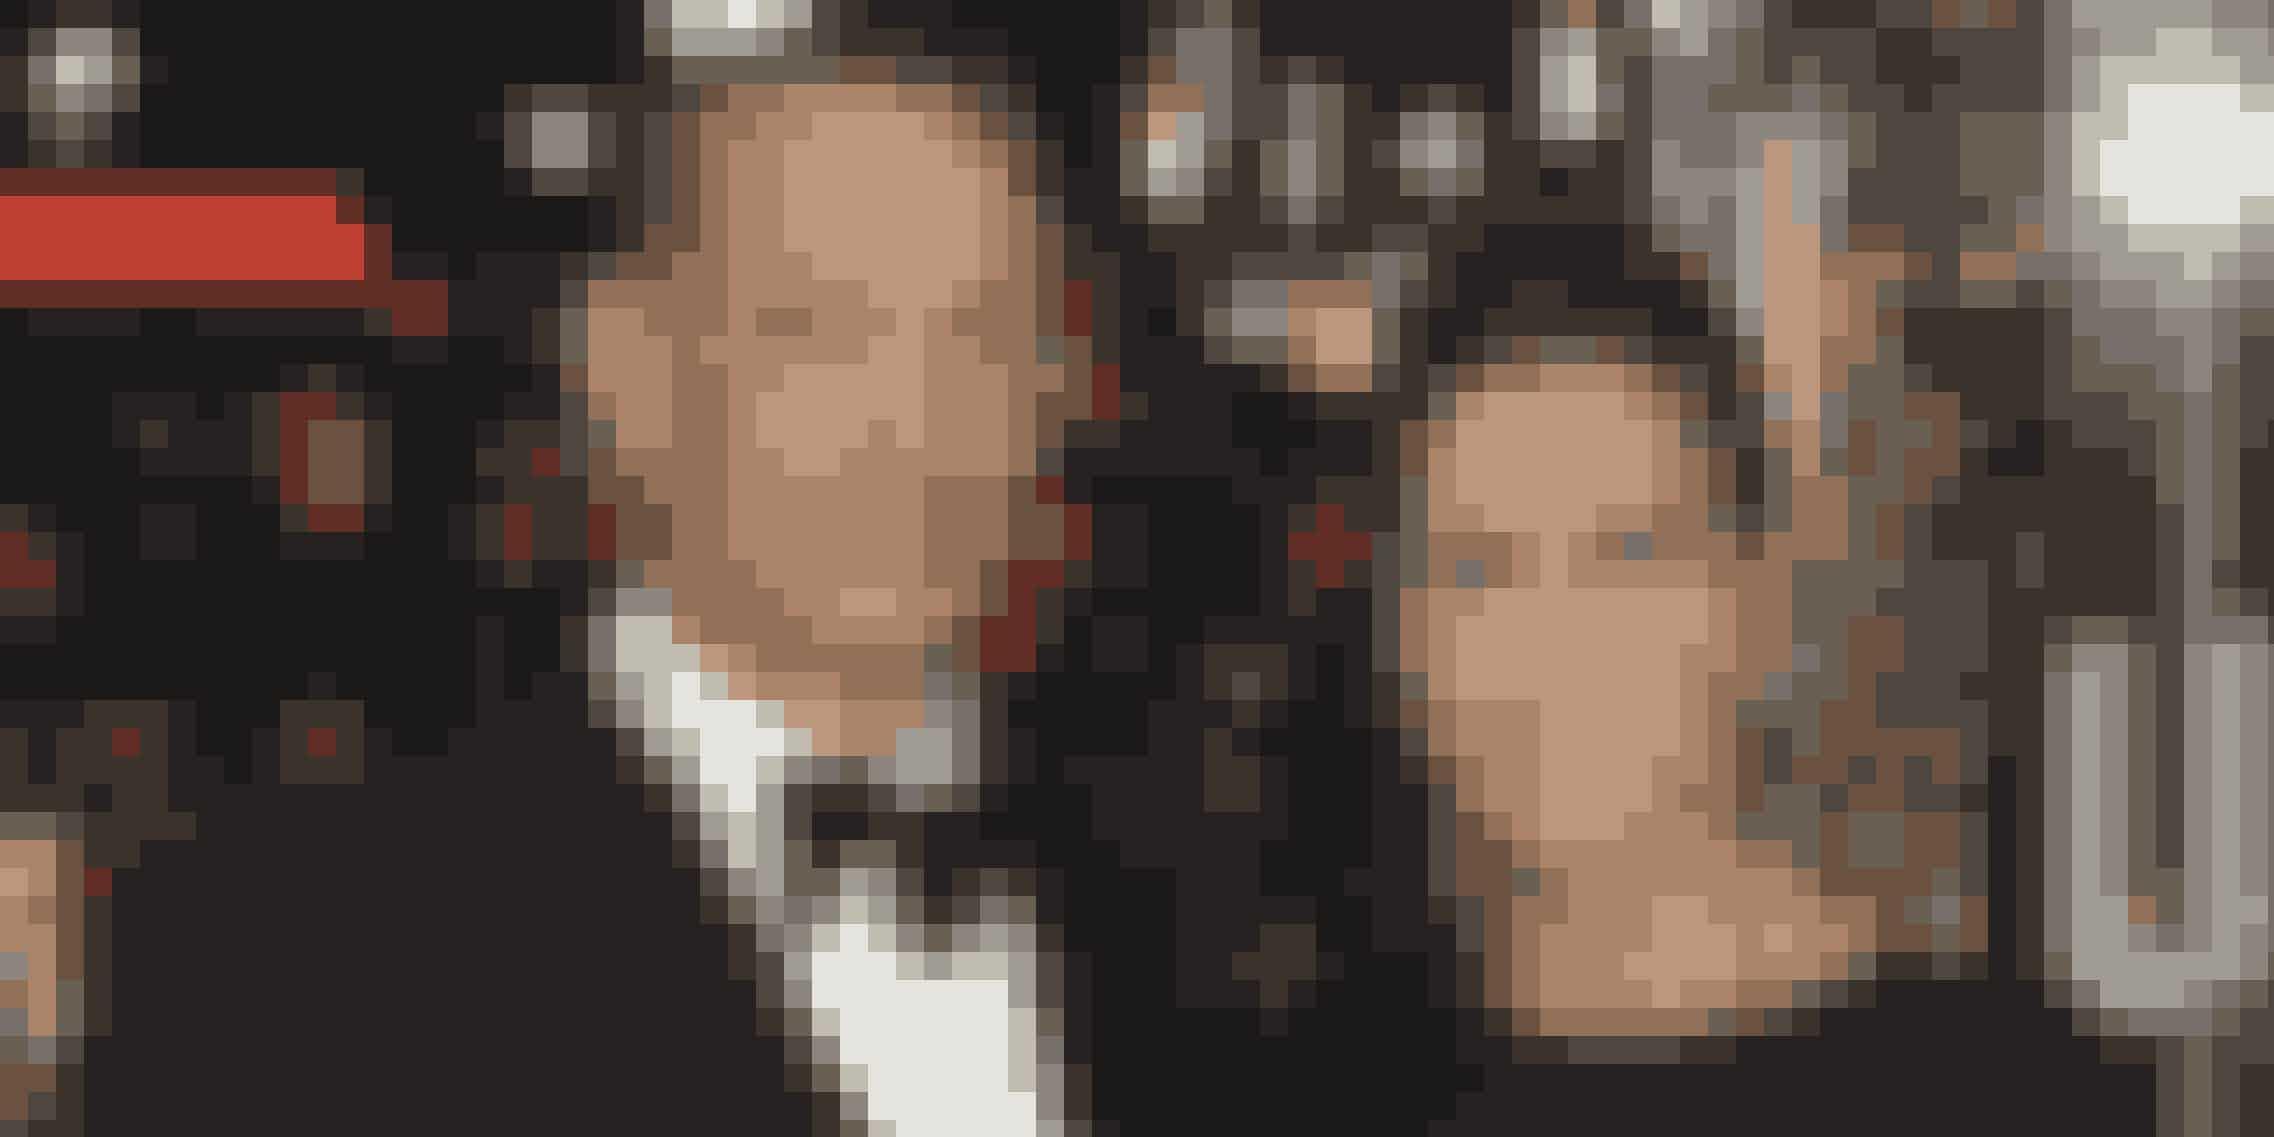 Tom Hanks og hustruen Rita Wilson er 'still going strong', selv om de i år kan fejre 30-års bryllupsdag - helt uhørt i Hollywod-sammenhæng.